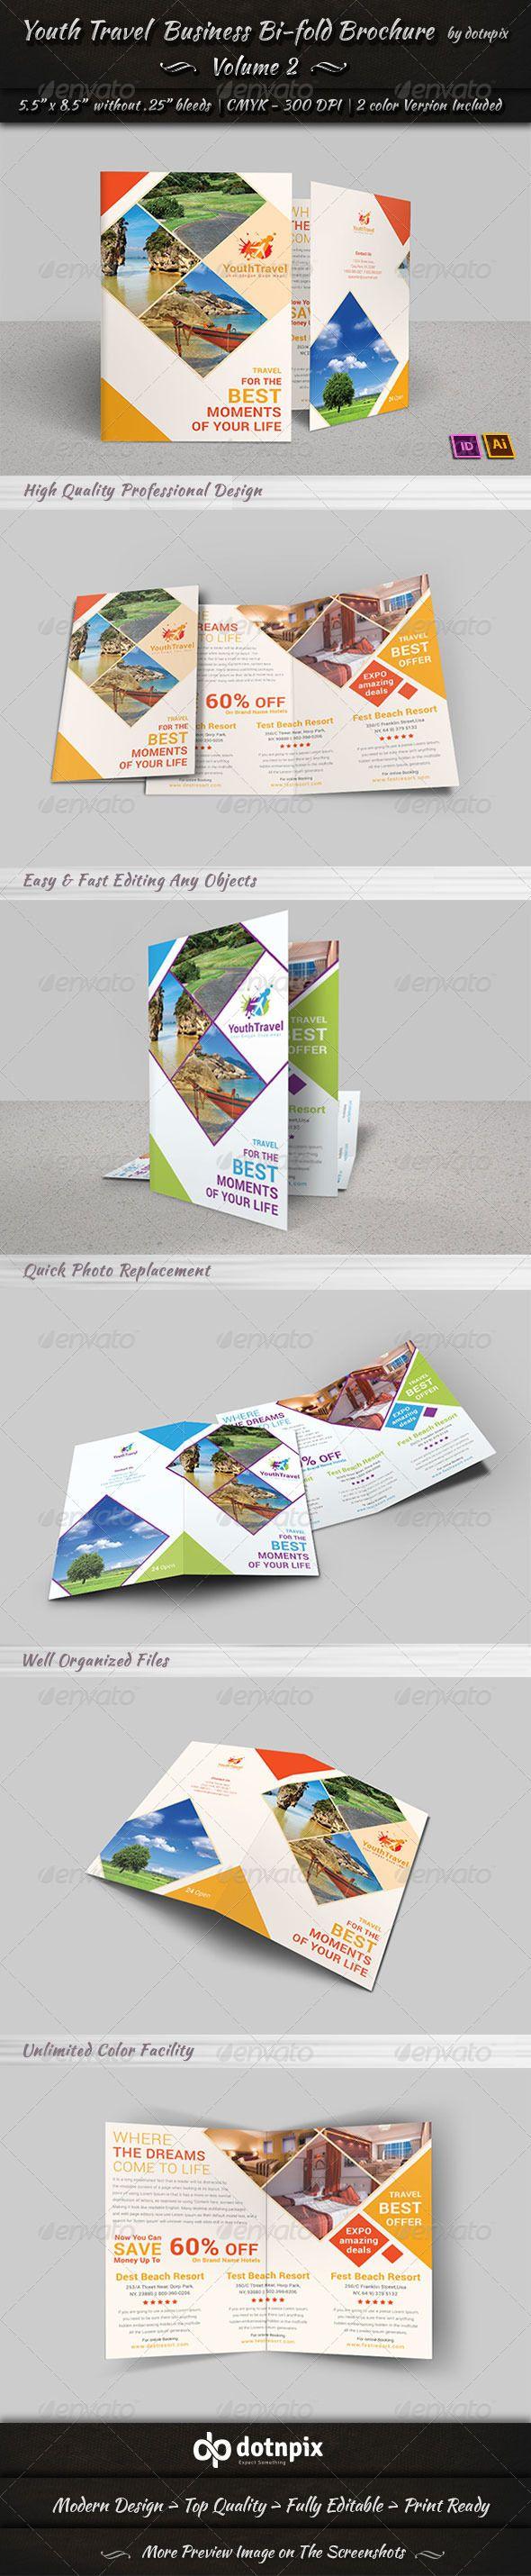 Travel | Tourism Bi-Fold Brochure | Volume 3 - Corporate Brochures